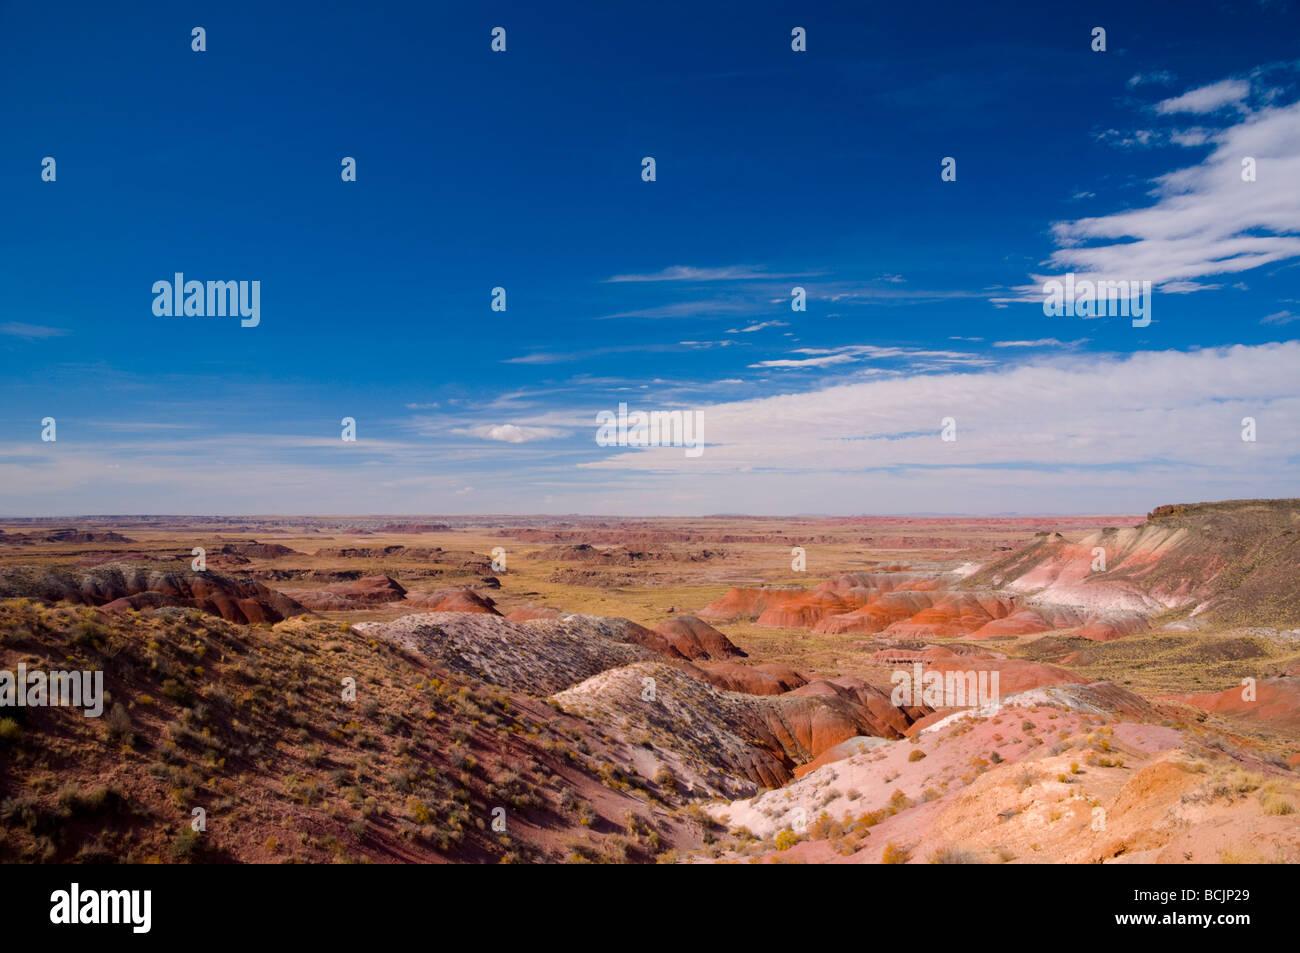 USA, Arizona, Petrified Forest National Park, Painted Desert - Stock Image